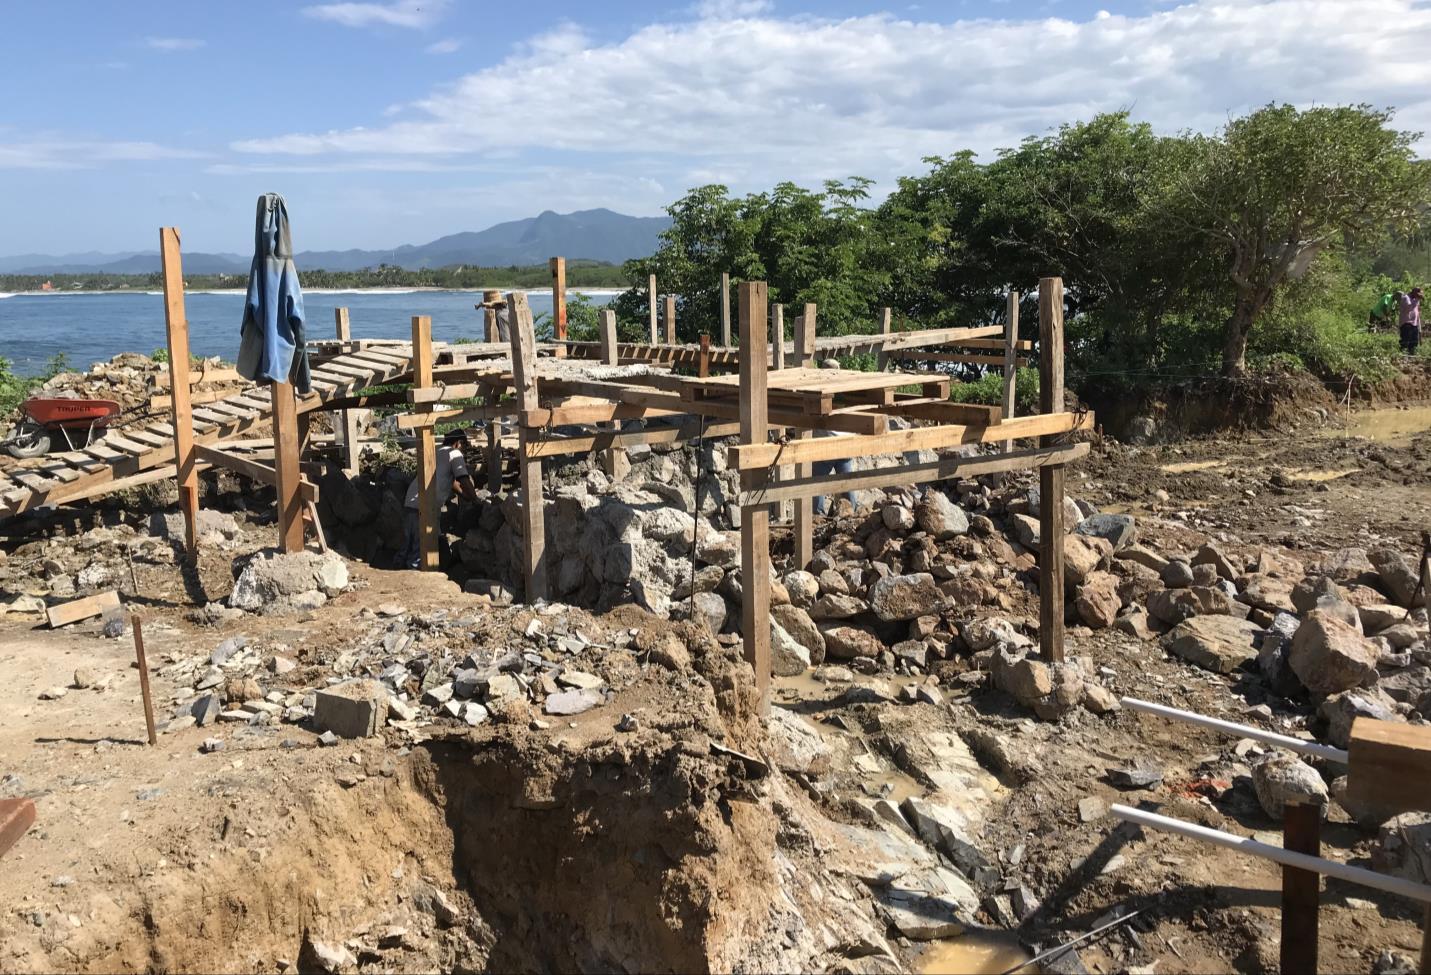 REPORTE-FOTOGRAFICO-PUNTA-MAJAHUA-23-SEPTIEMBRE-DEL-2018-045.jpg